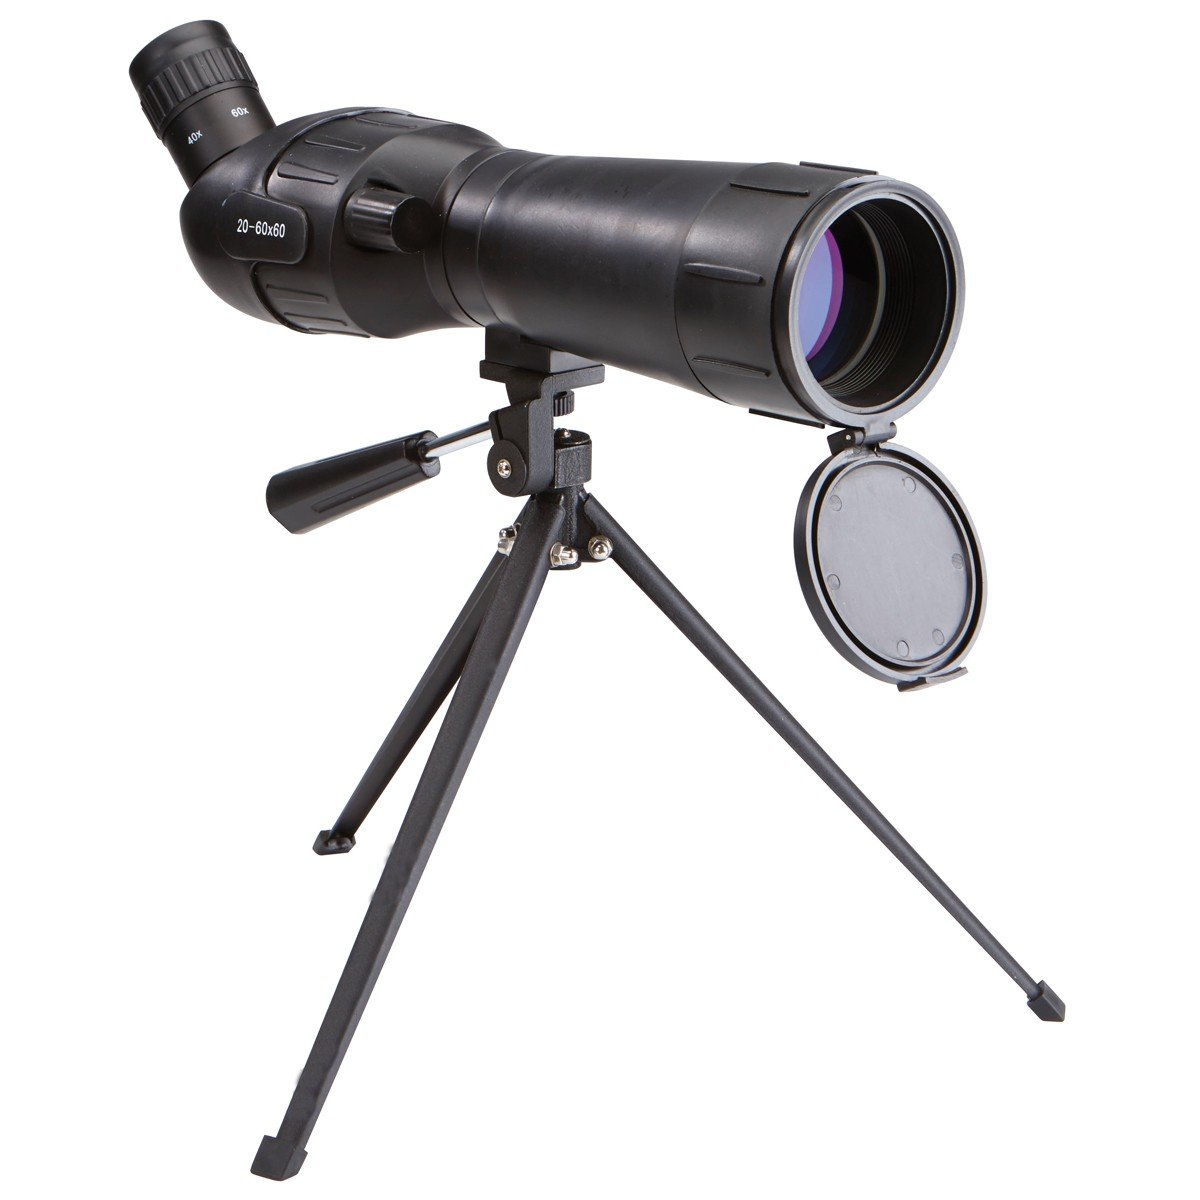 Baner 20 – 60 x 60 mm Spotting Scope with Tripod B078B1XW7X